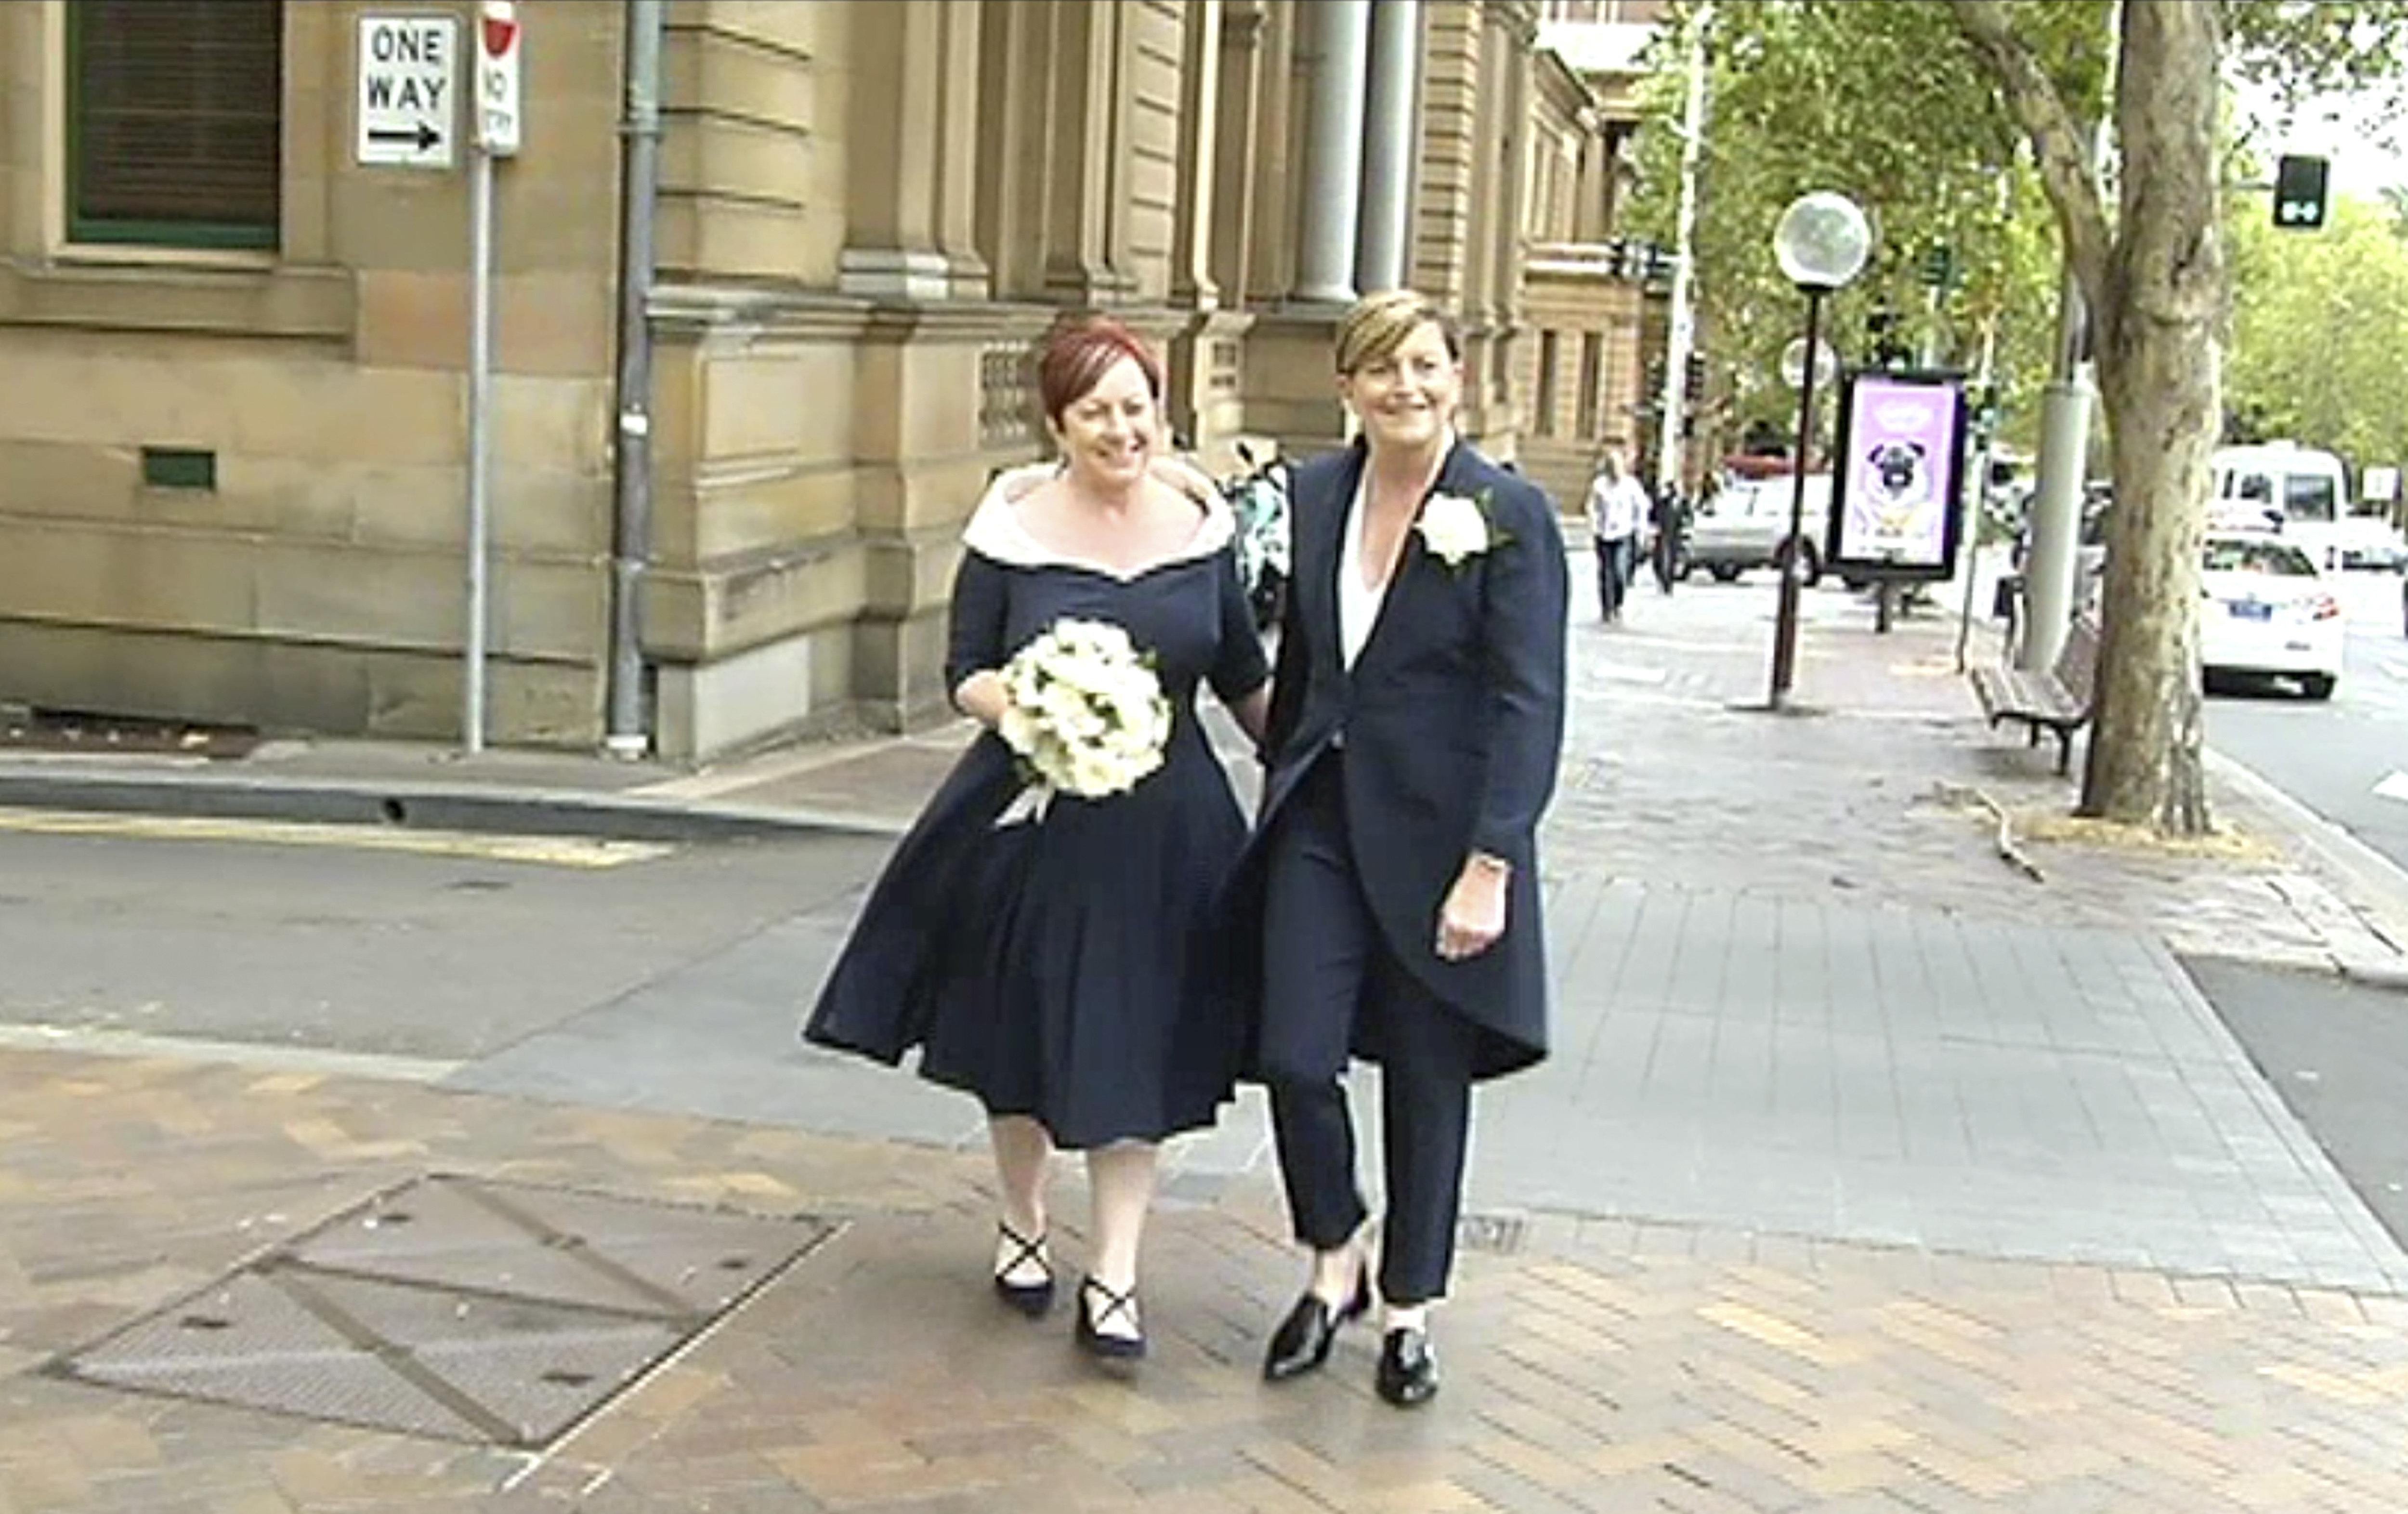 In this image made from Australia Broadcasting Corporation video, Christine Forster, right, sister of former Australian Prime Minister Tony Abbott, walks with her partner Virginia Edwards, Feb. 2, 2018, in Sydney, Australia